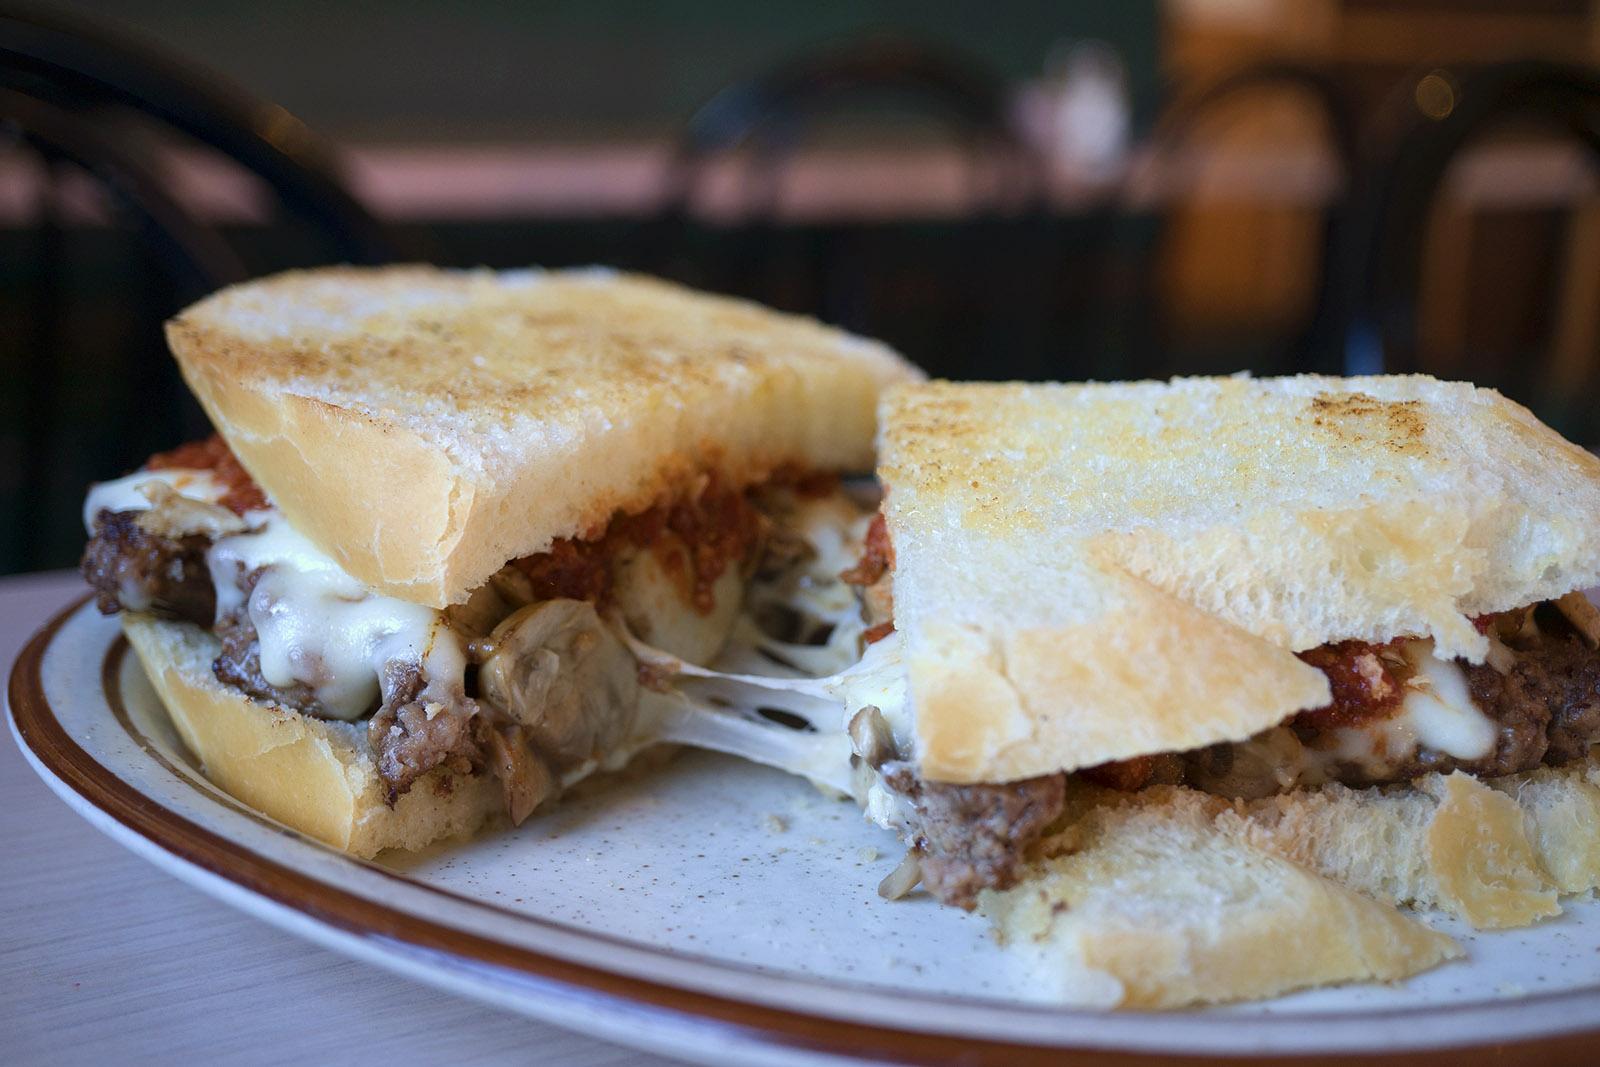 SATURDAY: Italian Steak Sandwich with Fries Image